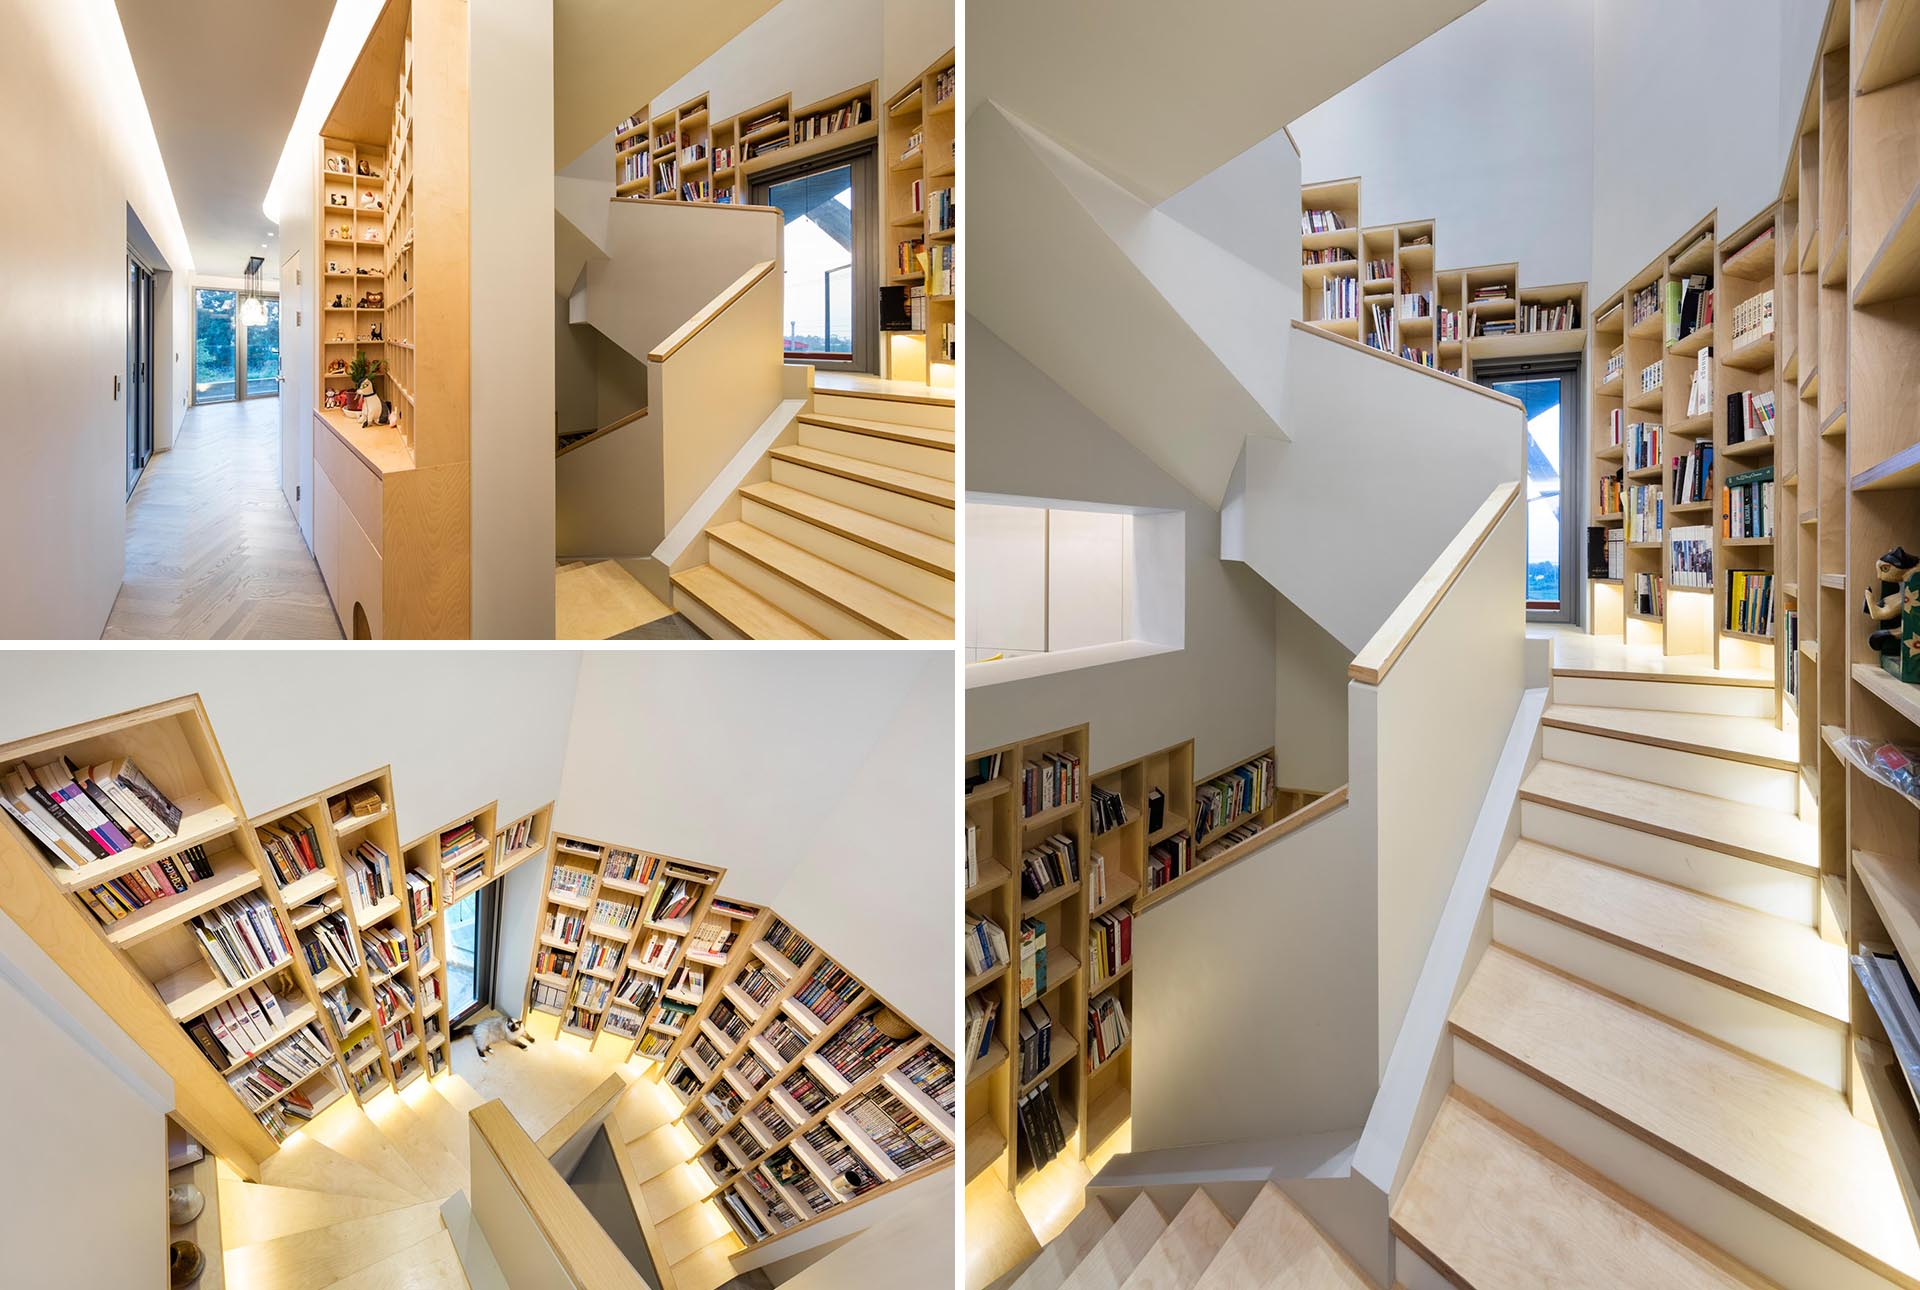 A built-in bookshelf that follows the staircase in a modern home.